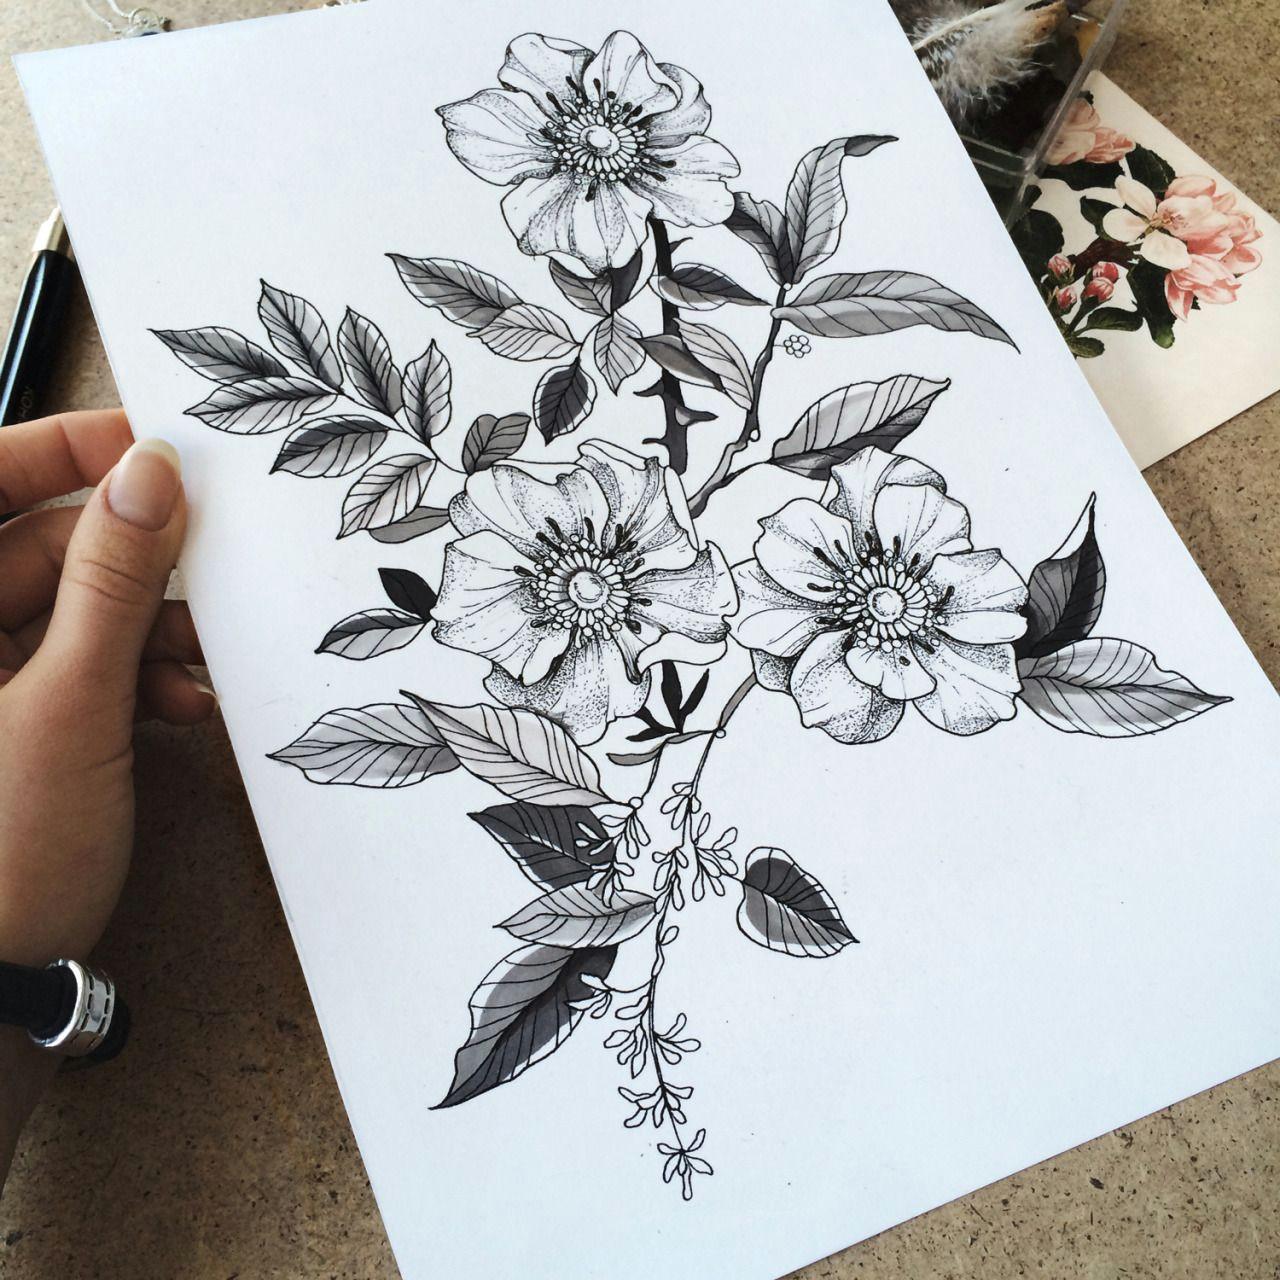 Drawing Of Wild Rose Familyinktattoo Wild Roses Tattooskech Body Modification